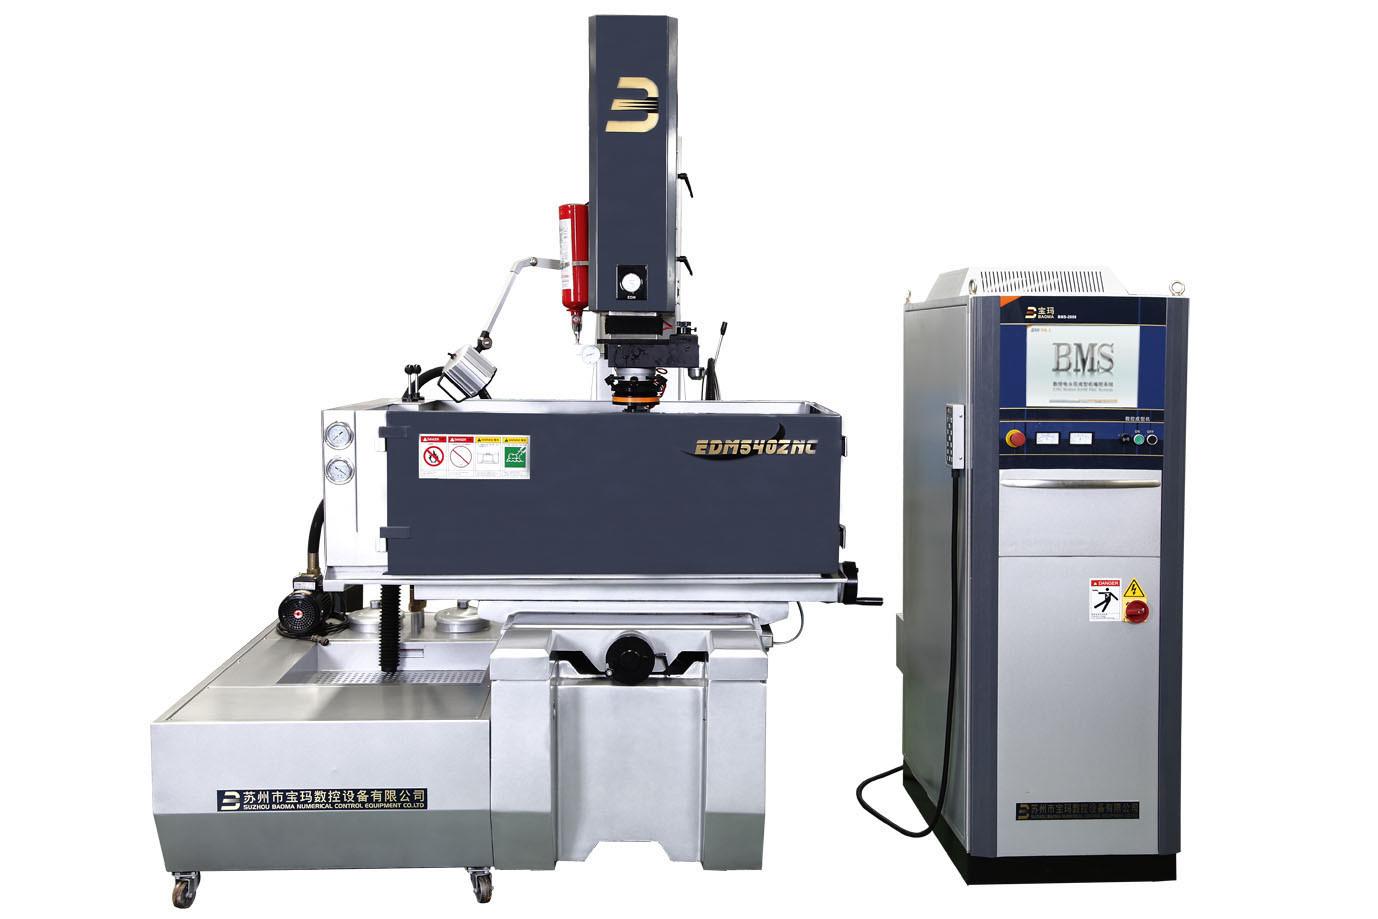 EDM540znc EDM Sinker Machine